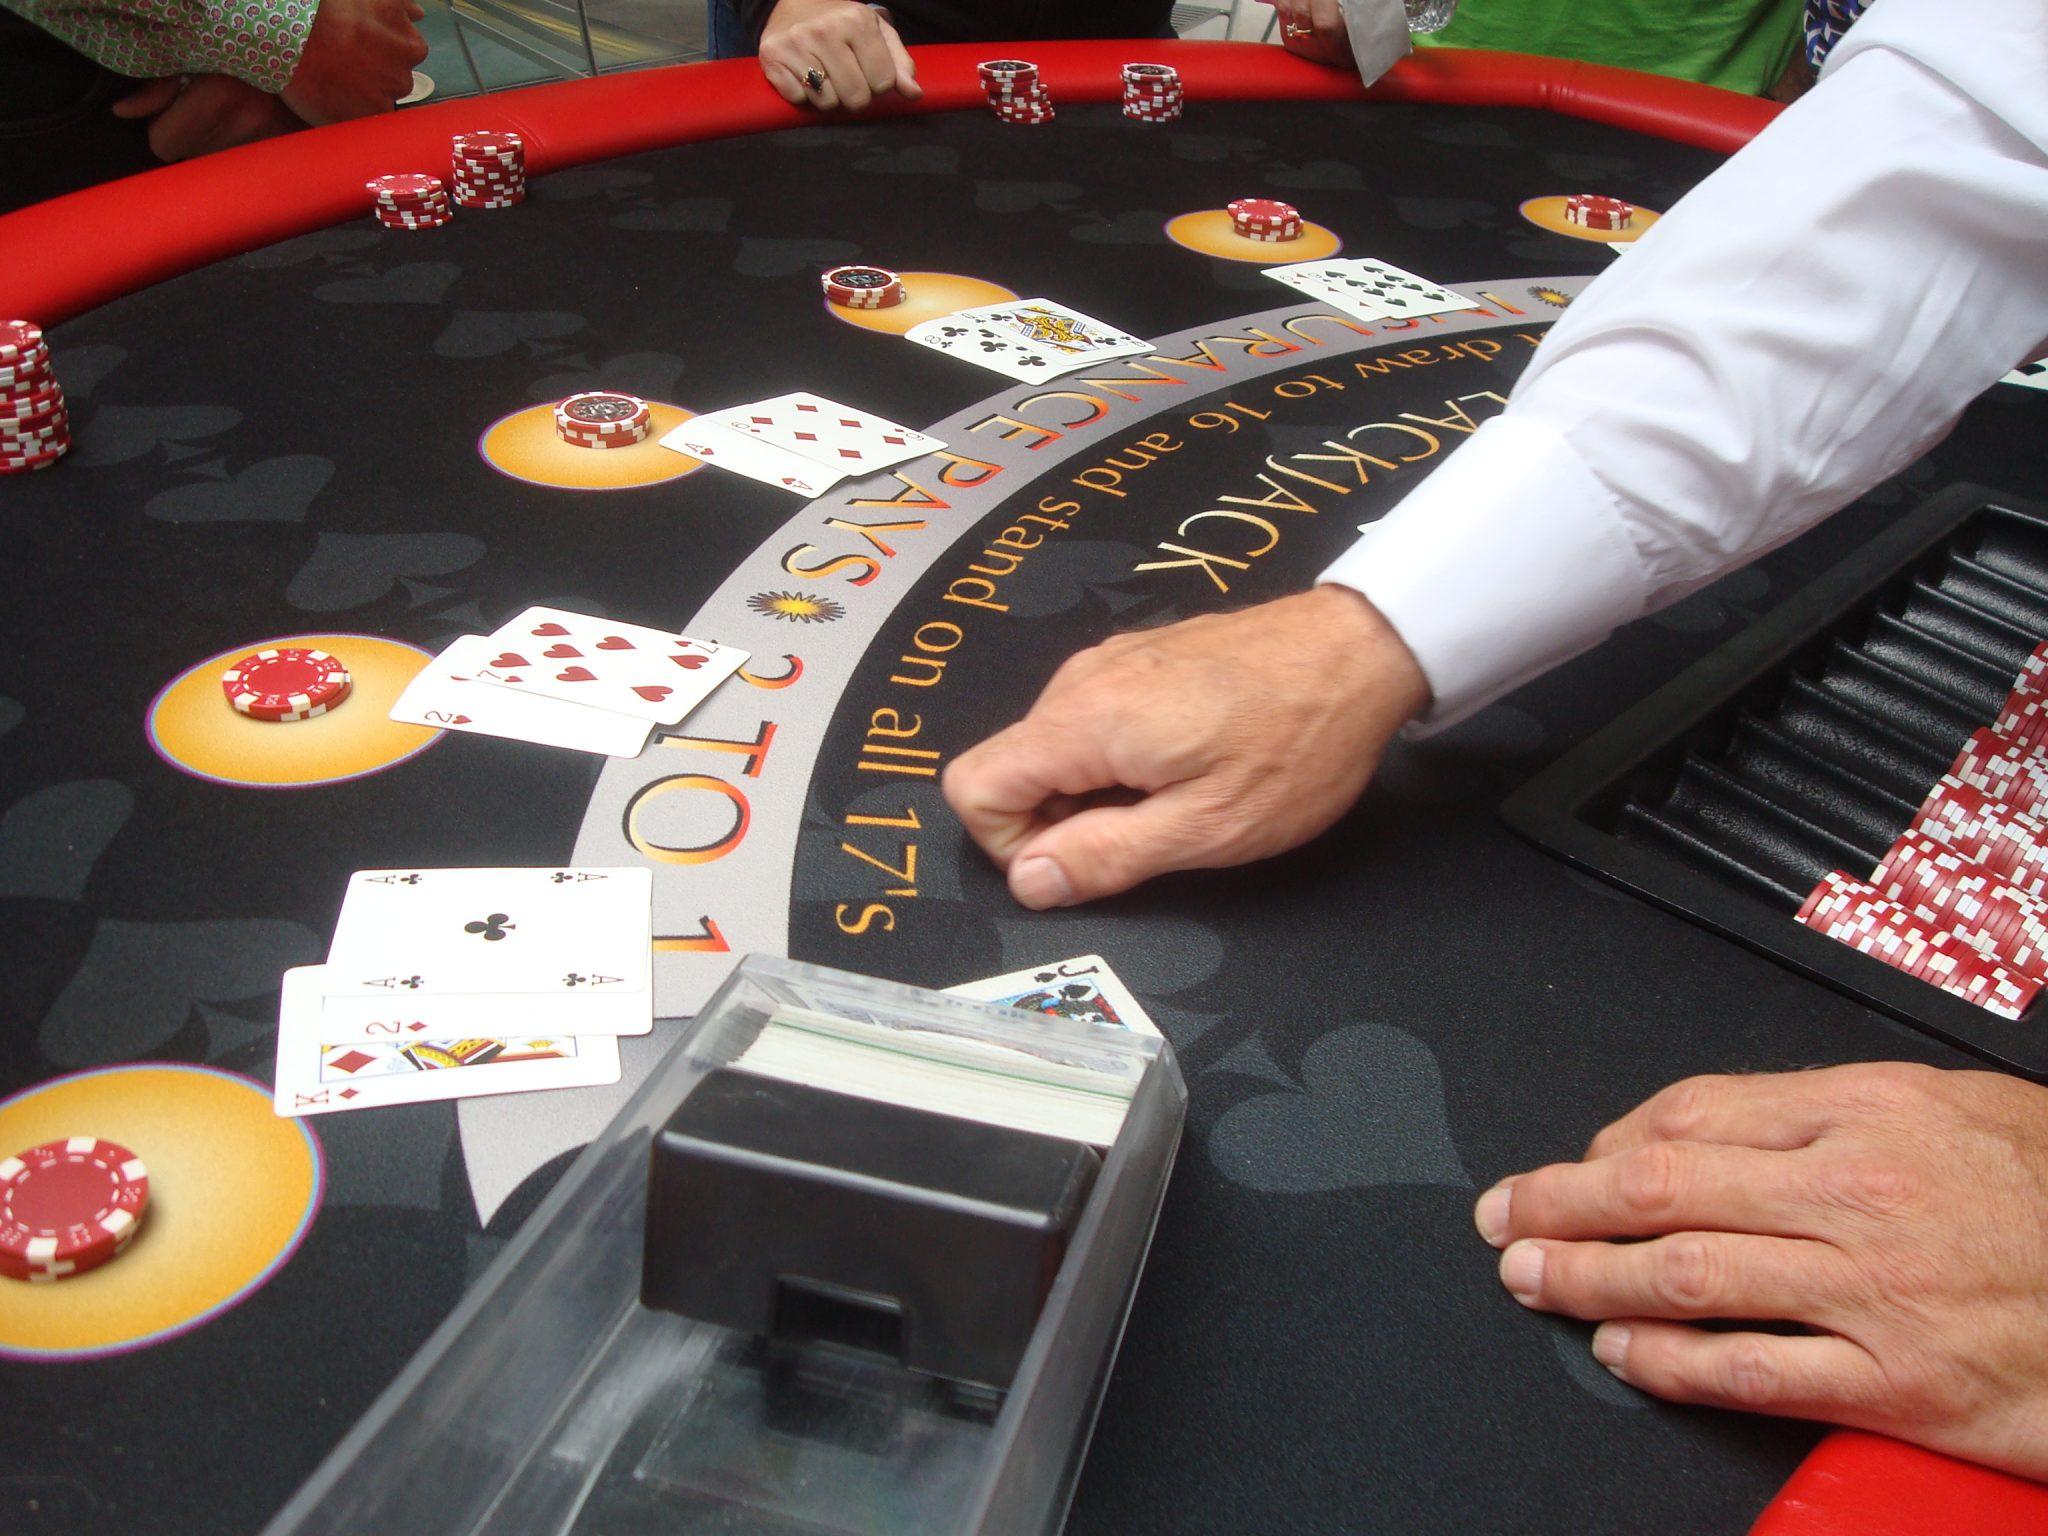 Casino games rentals toronto mgm grand theater foxwoods casino